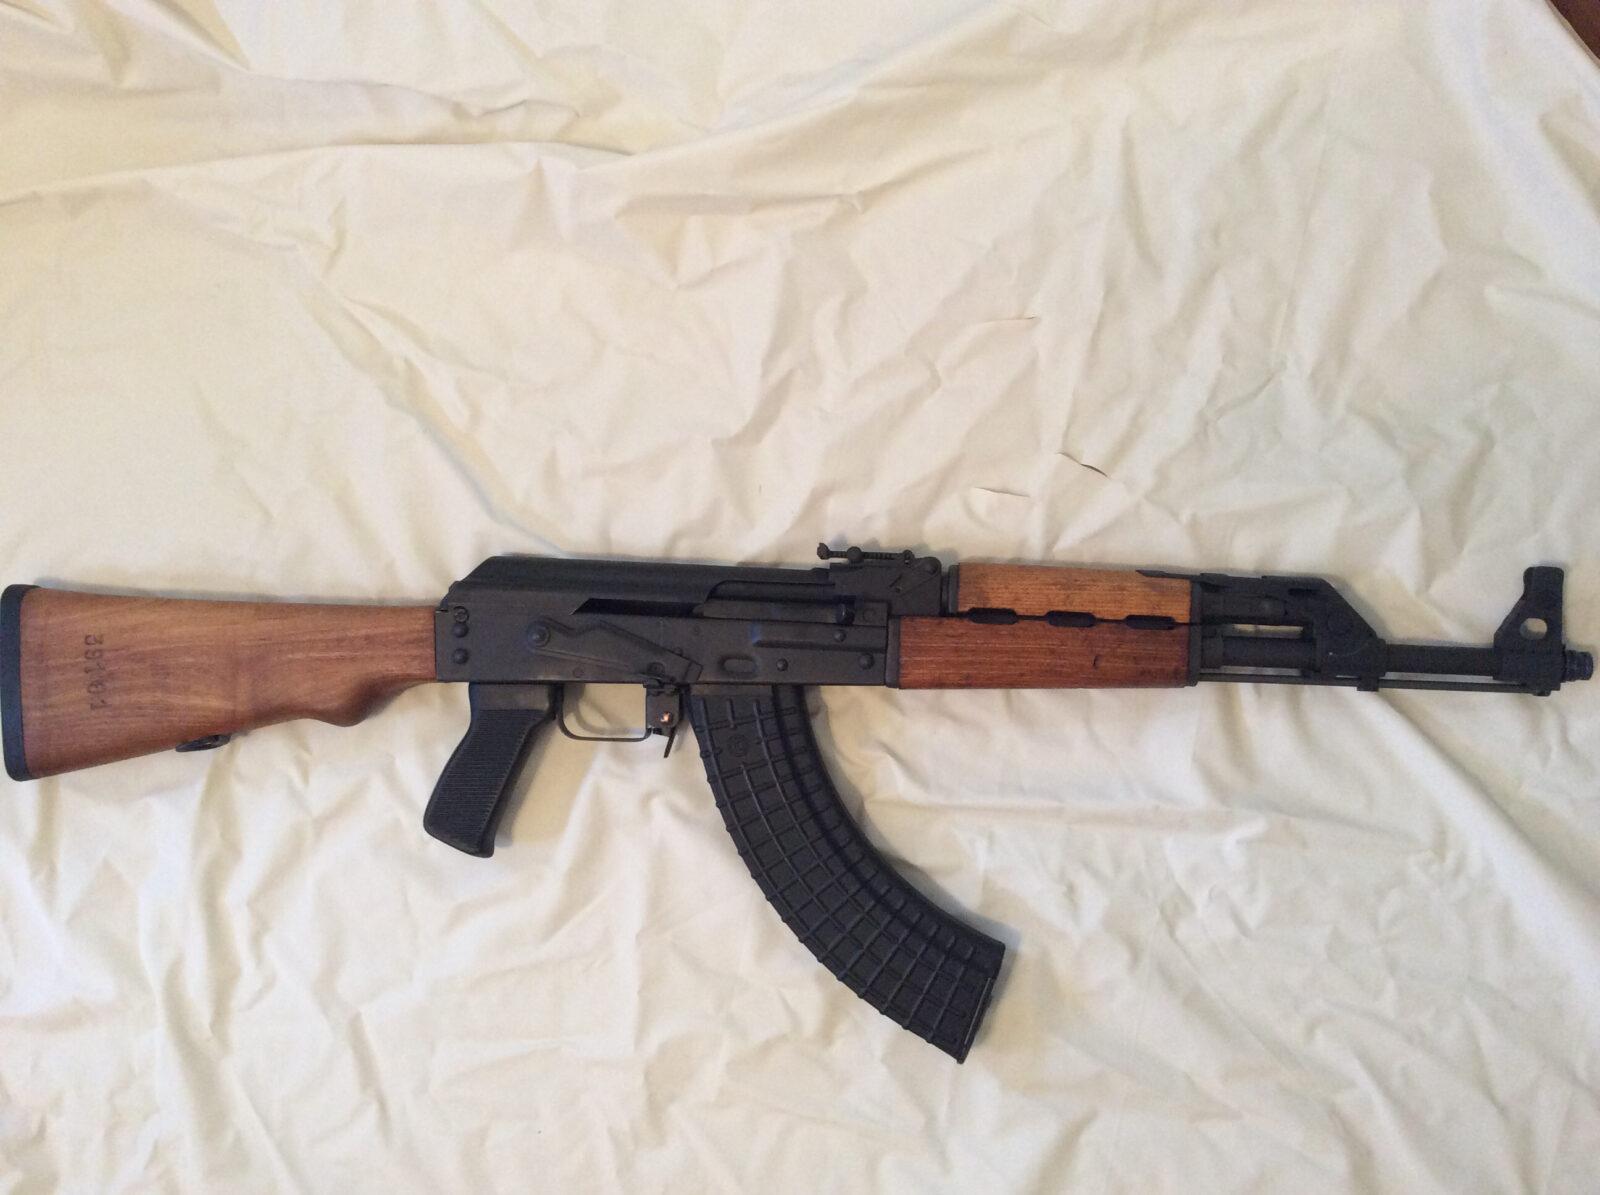 7343518eac83b5c913f22058ecdf800b zps5fd4b604. AK and related rifle furniture   grips  handguards  and butt stocks